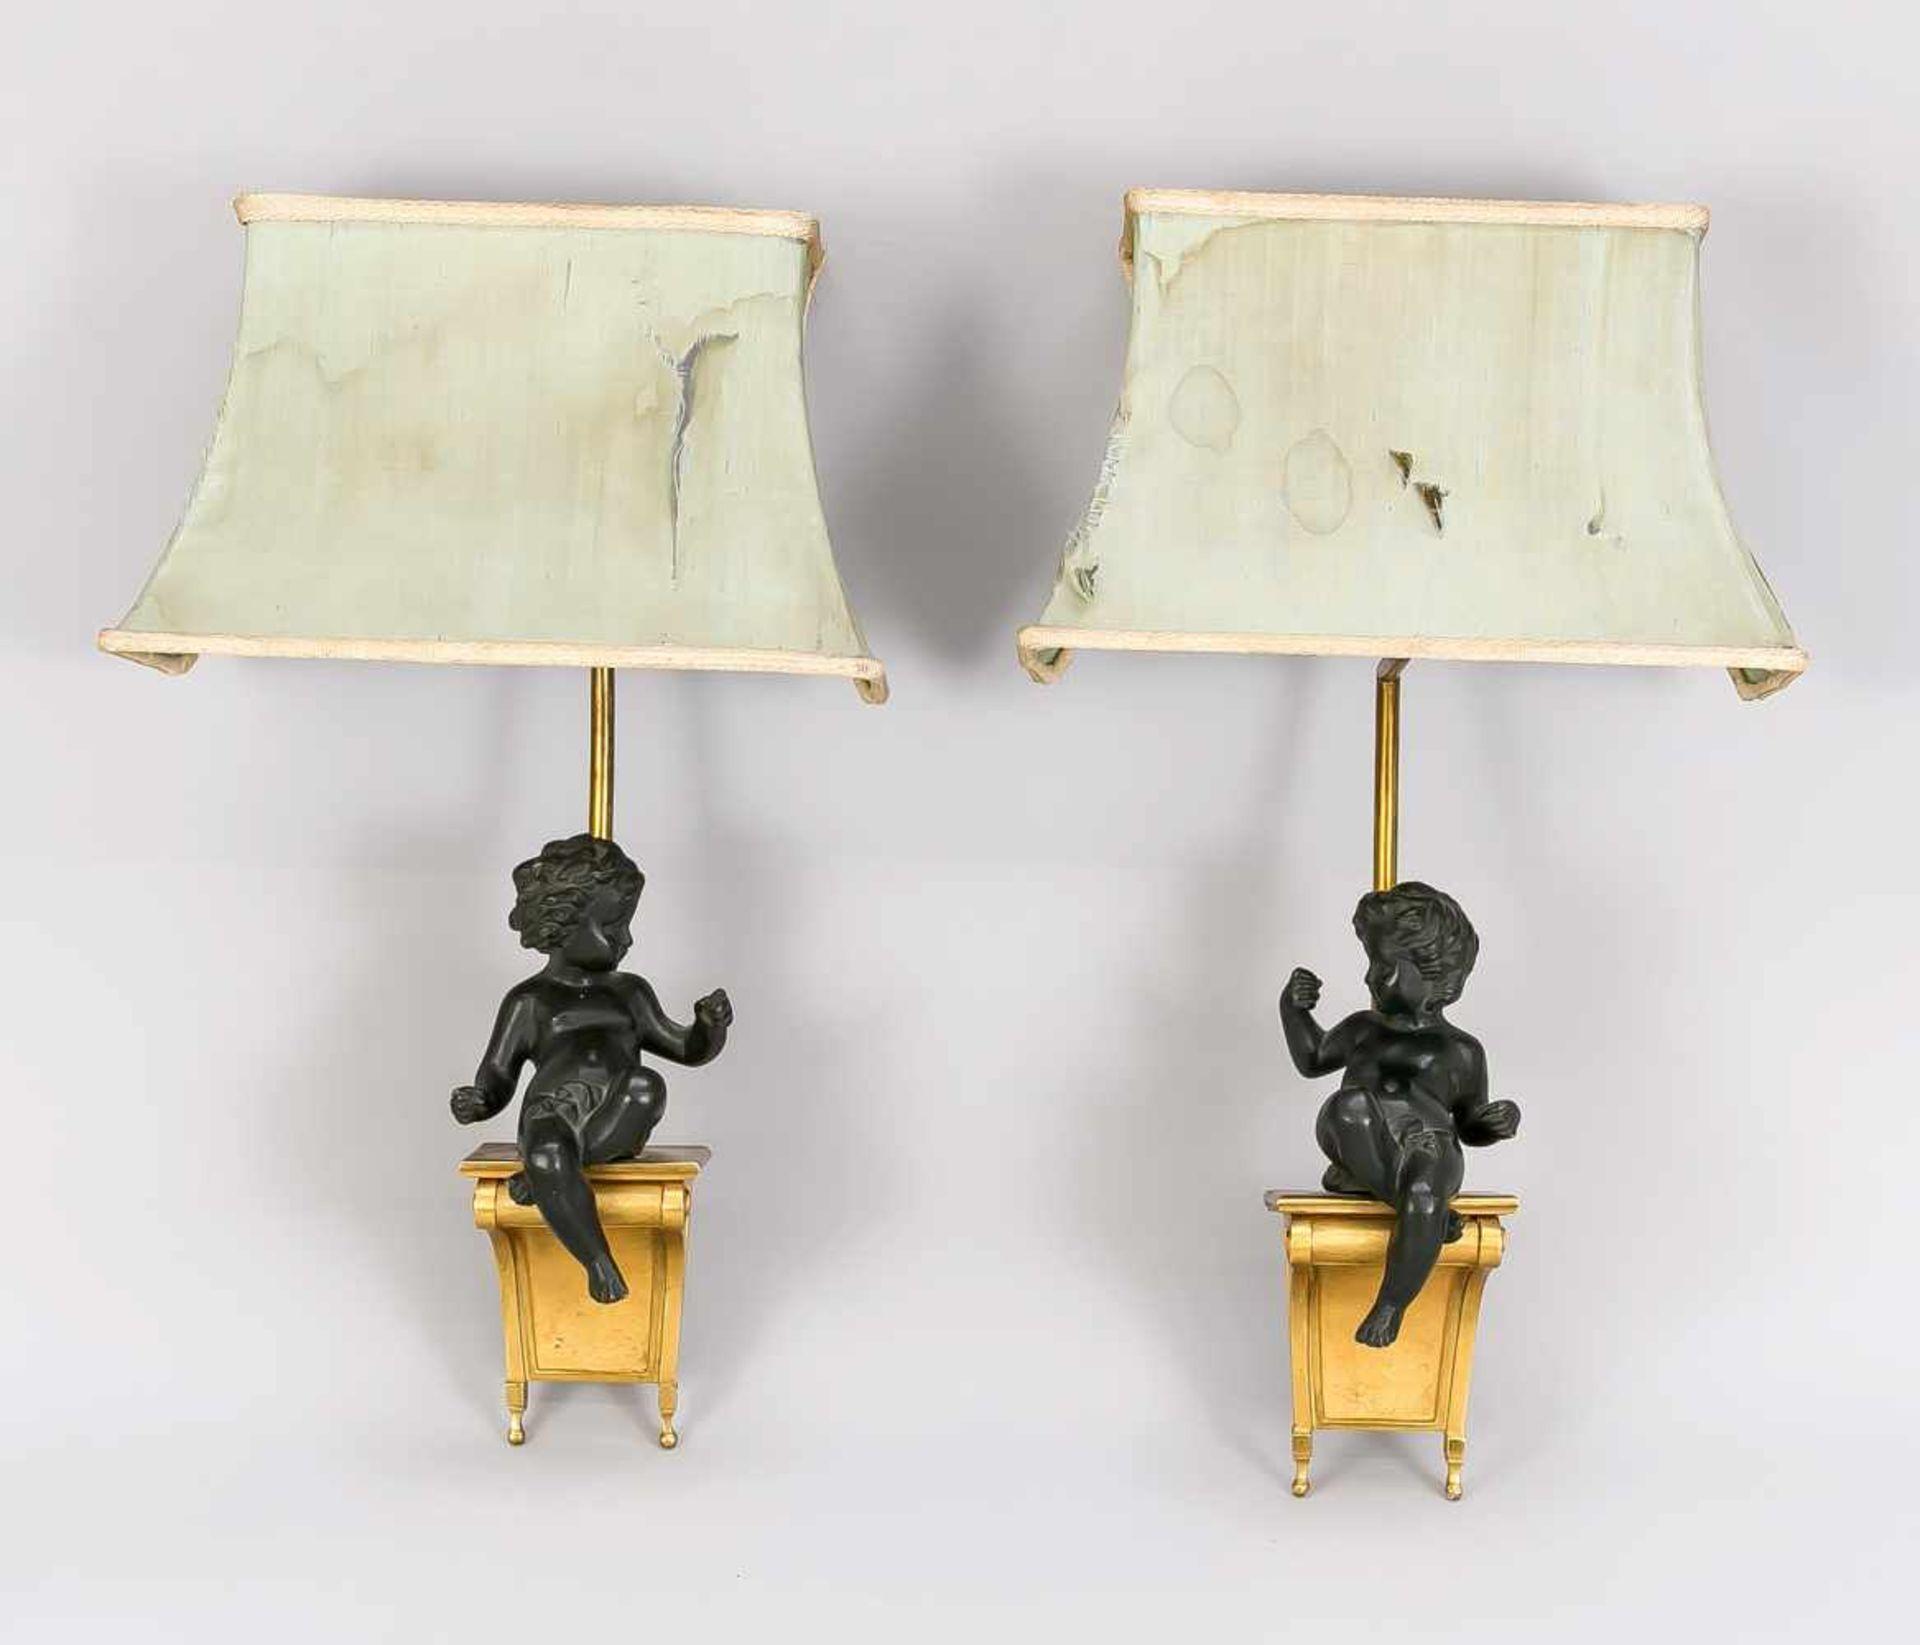 Paar figürliche Wandleuchter, 1. H. 20. Jh., Bronze, Messing. Knabe auf vergoldeter